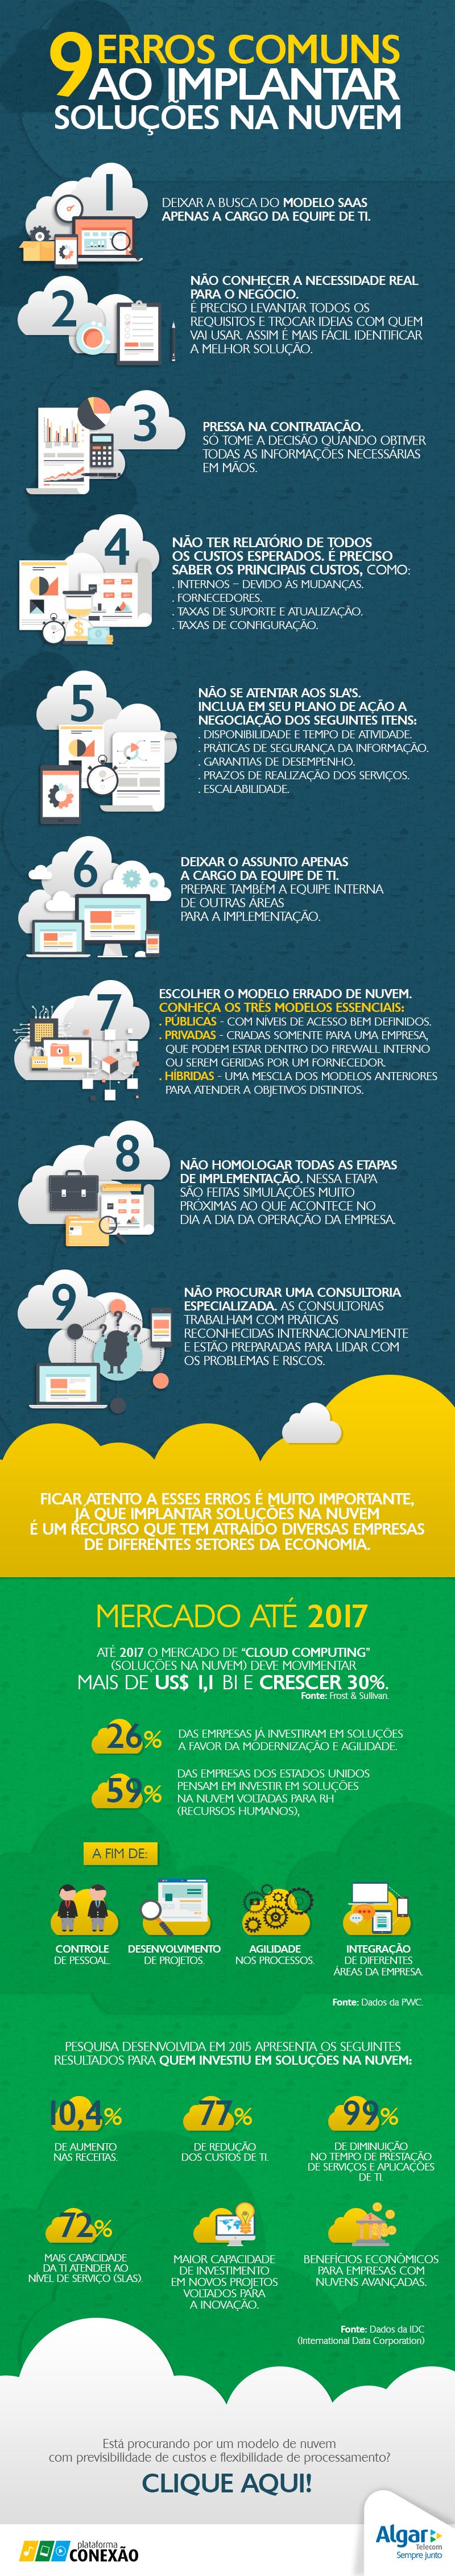 Infográfico - Soluções na nuvem